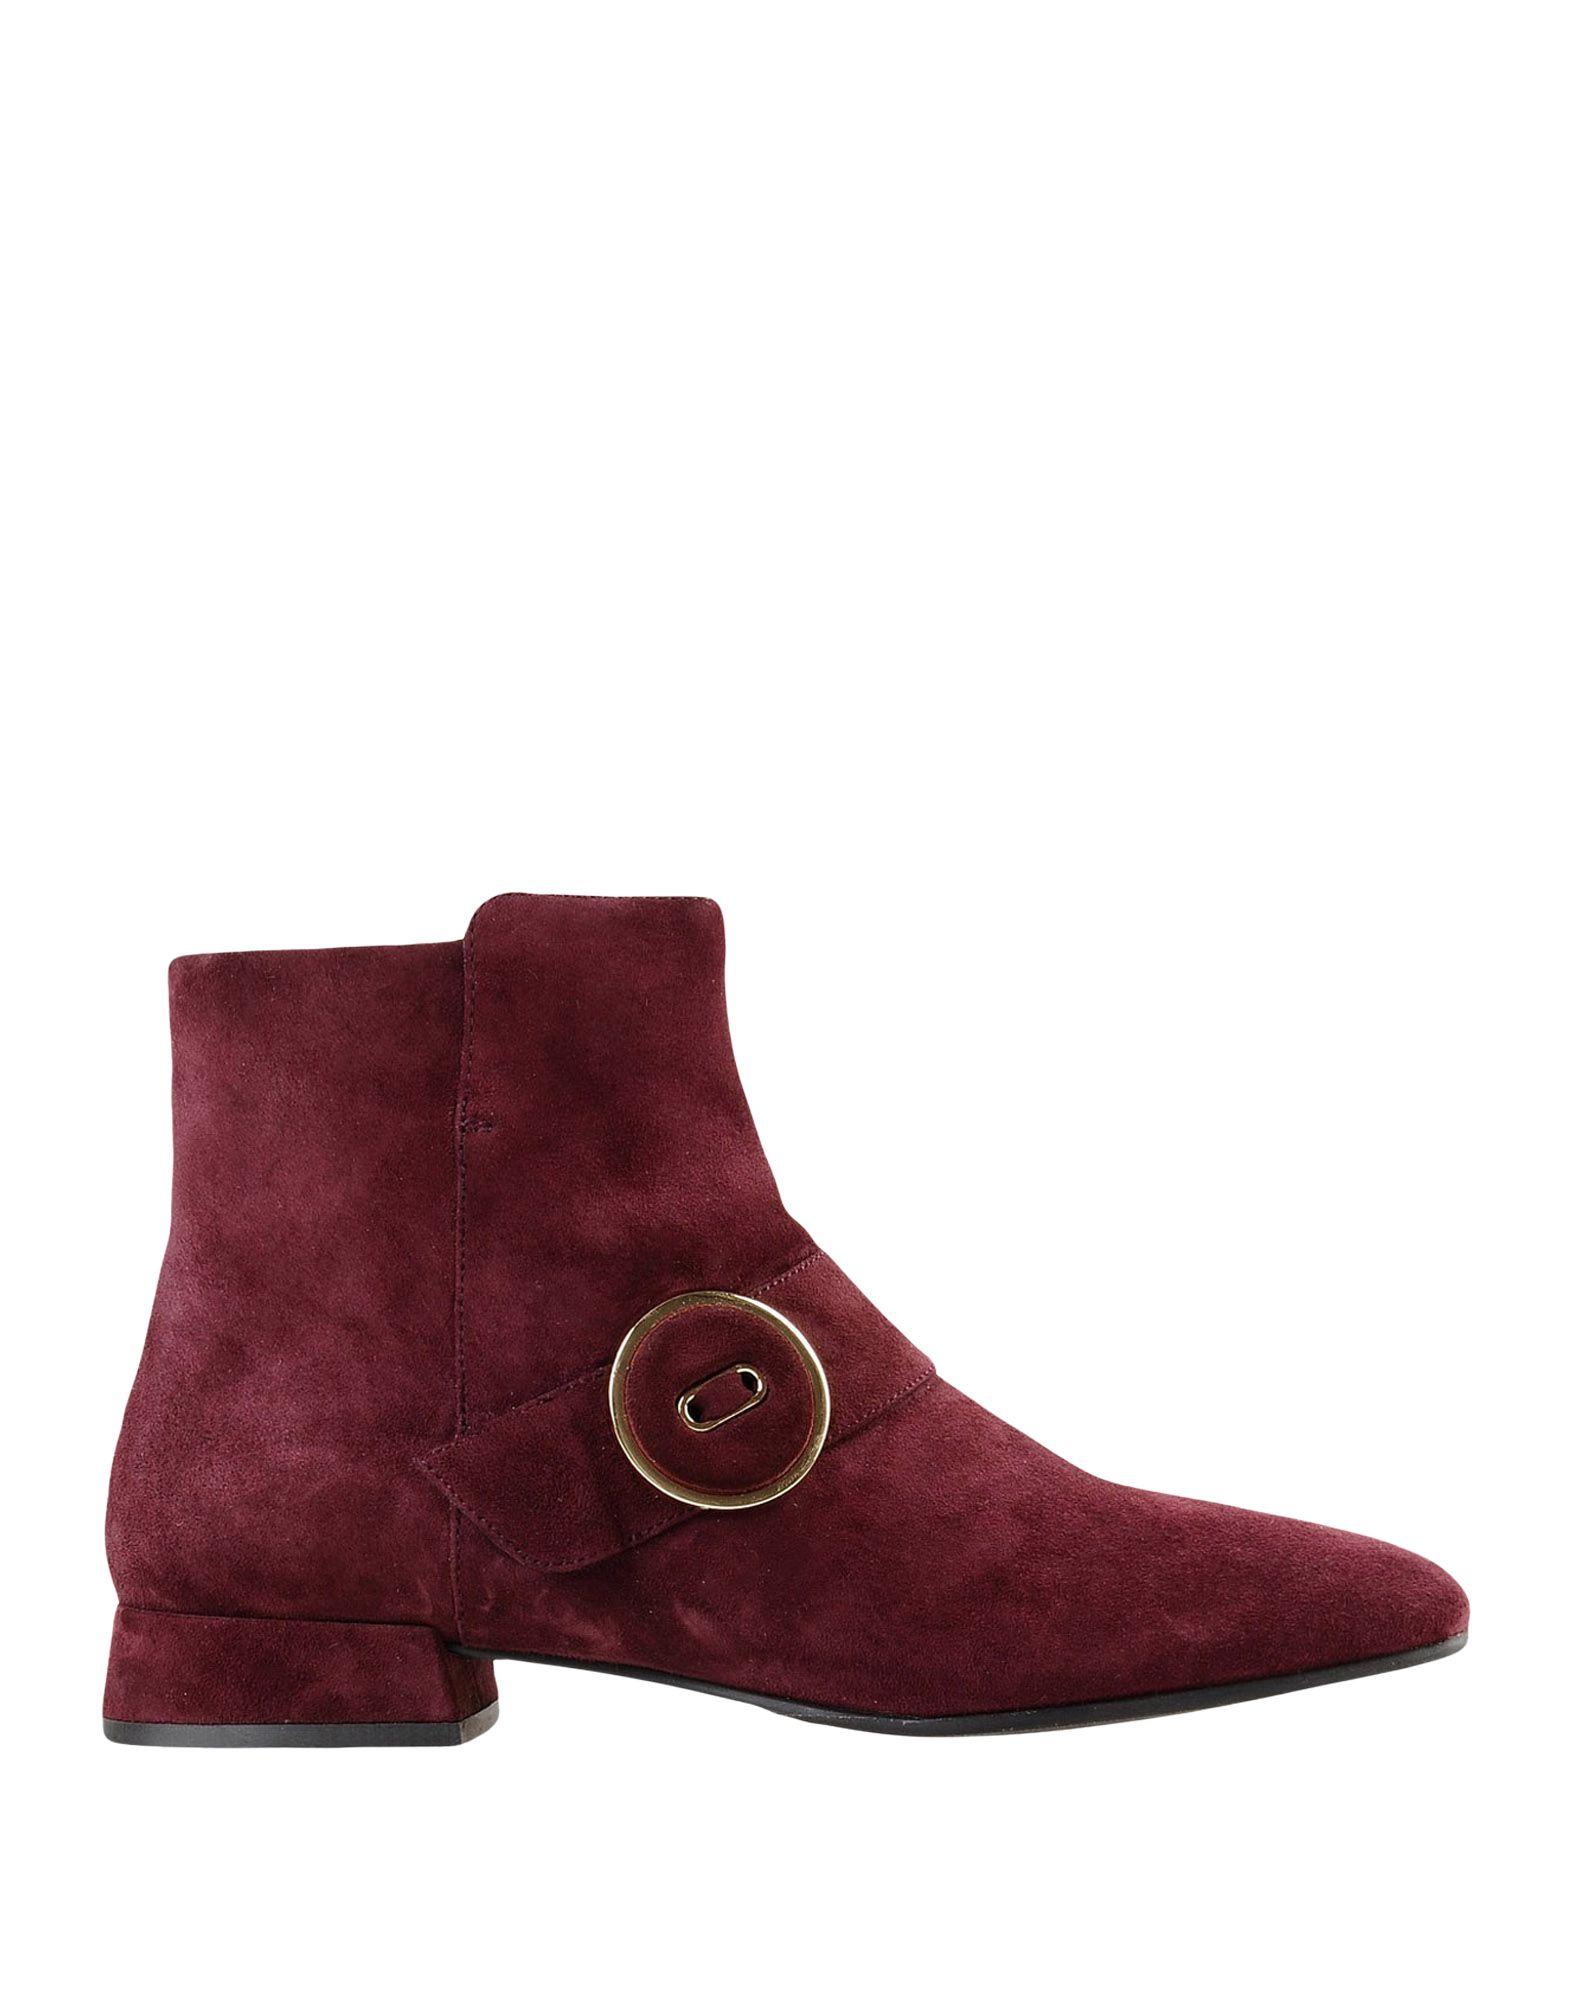 Stilvolle billige Schuhe Bruno Premi Stiefelette Damen  11533104OF